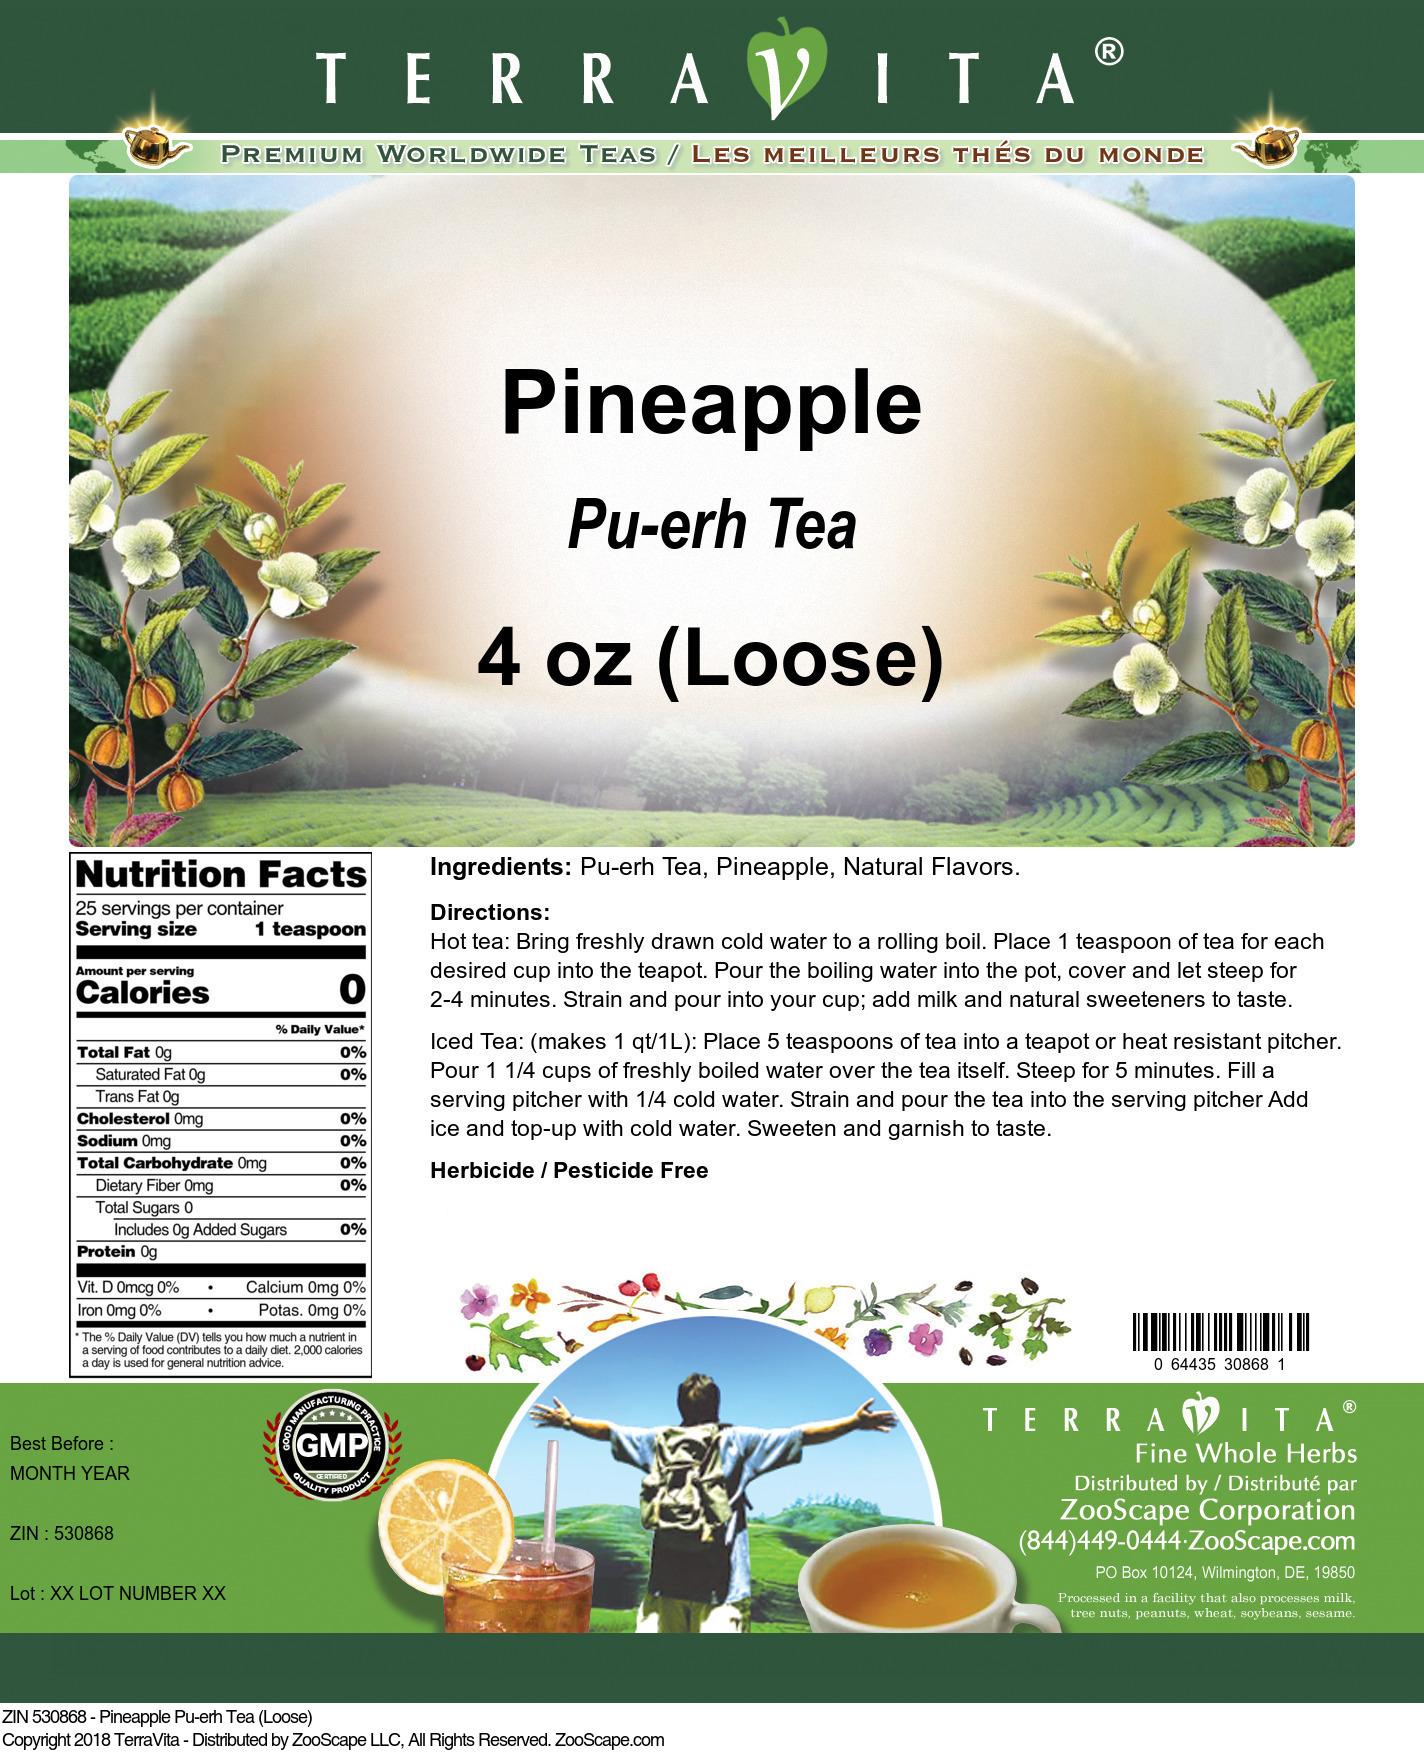 Pineapple Pu-erh Tea (Loose)